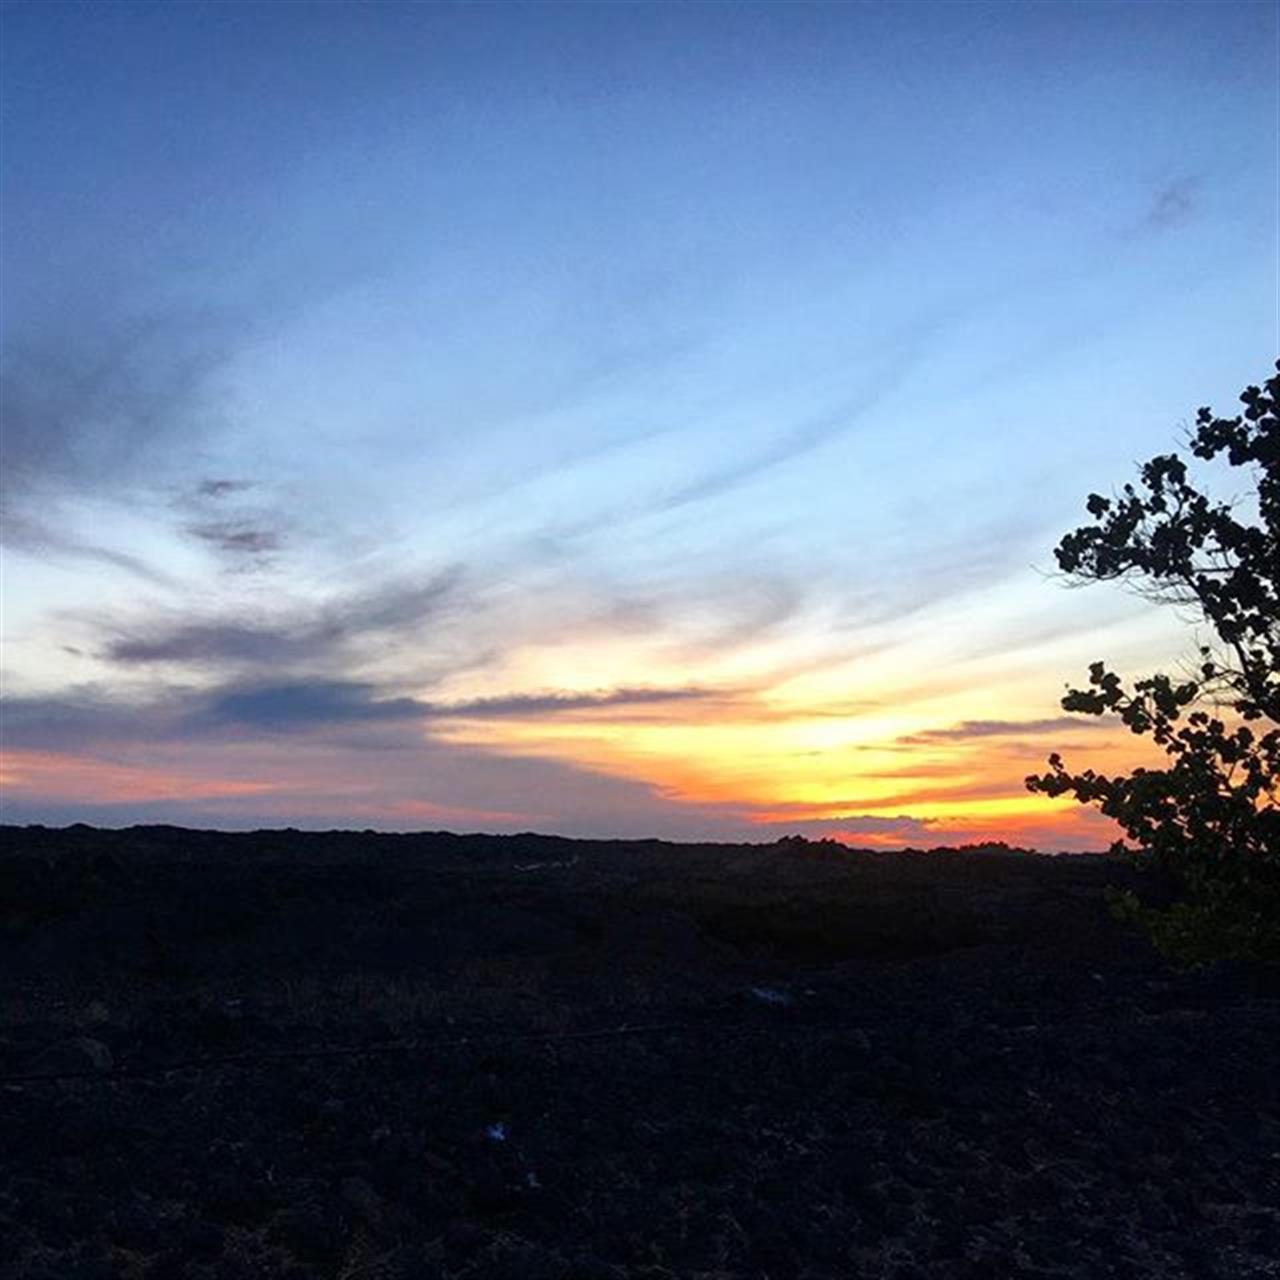 A sunset a day! ? Pretty sunset tonight from my office! #sunset #hawaiilife #waikoloabeachresort